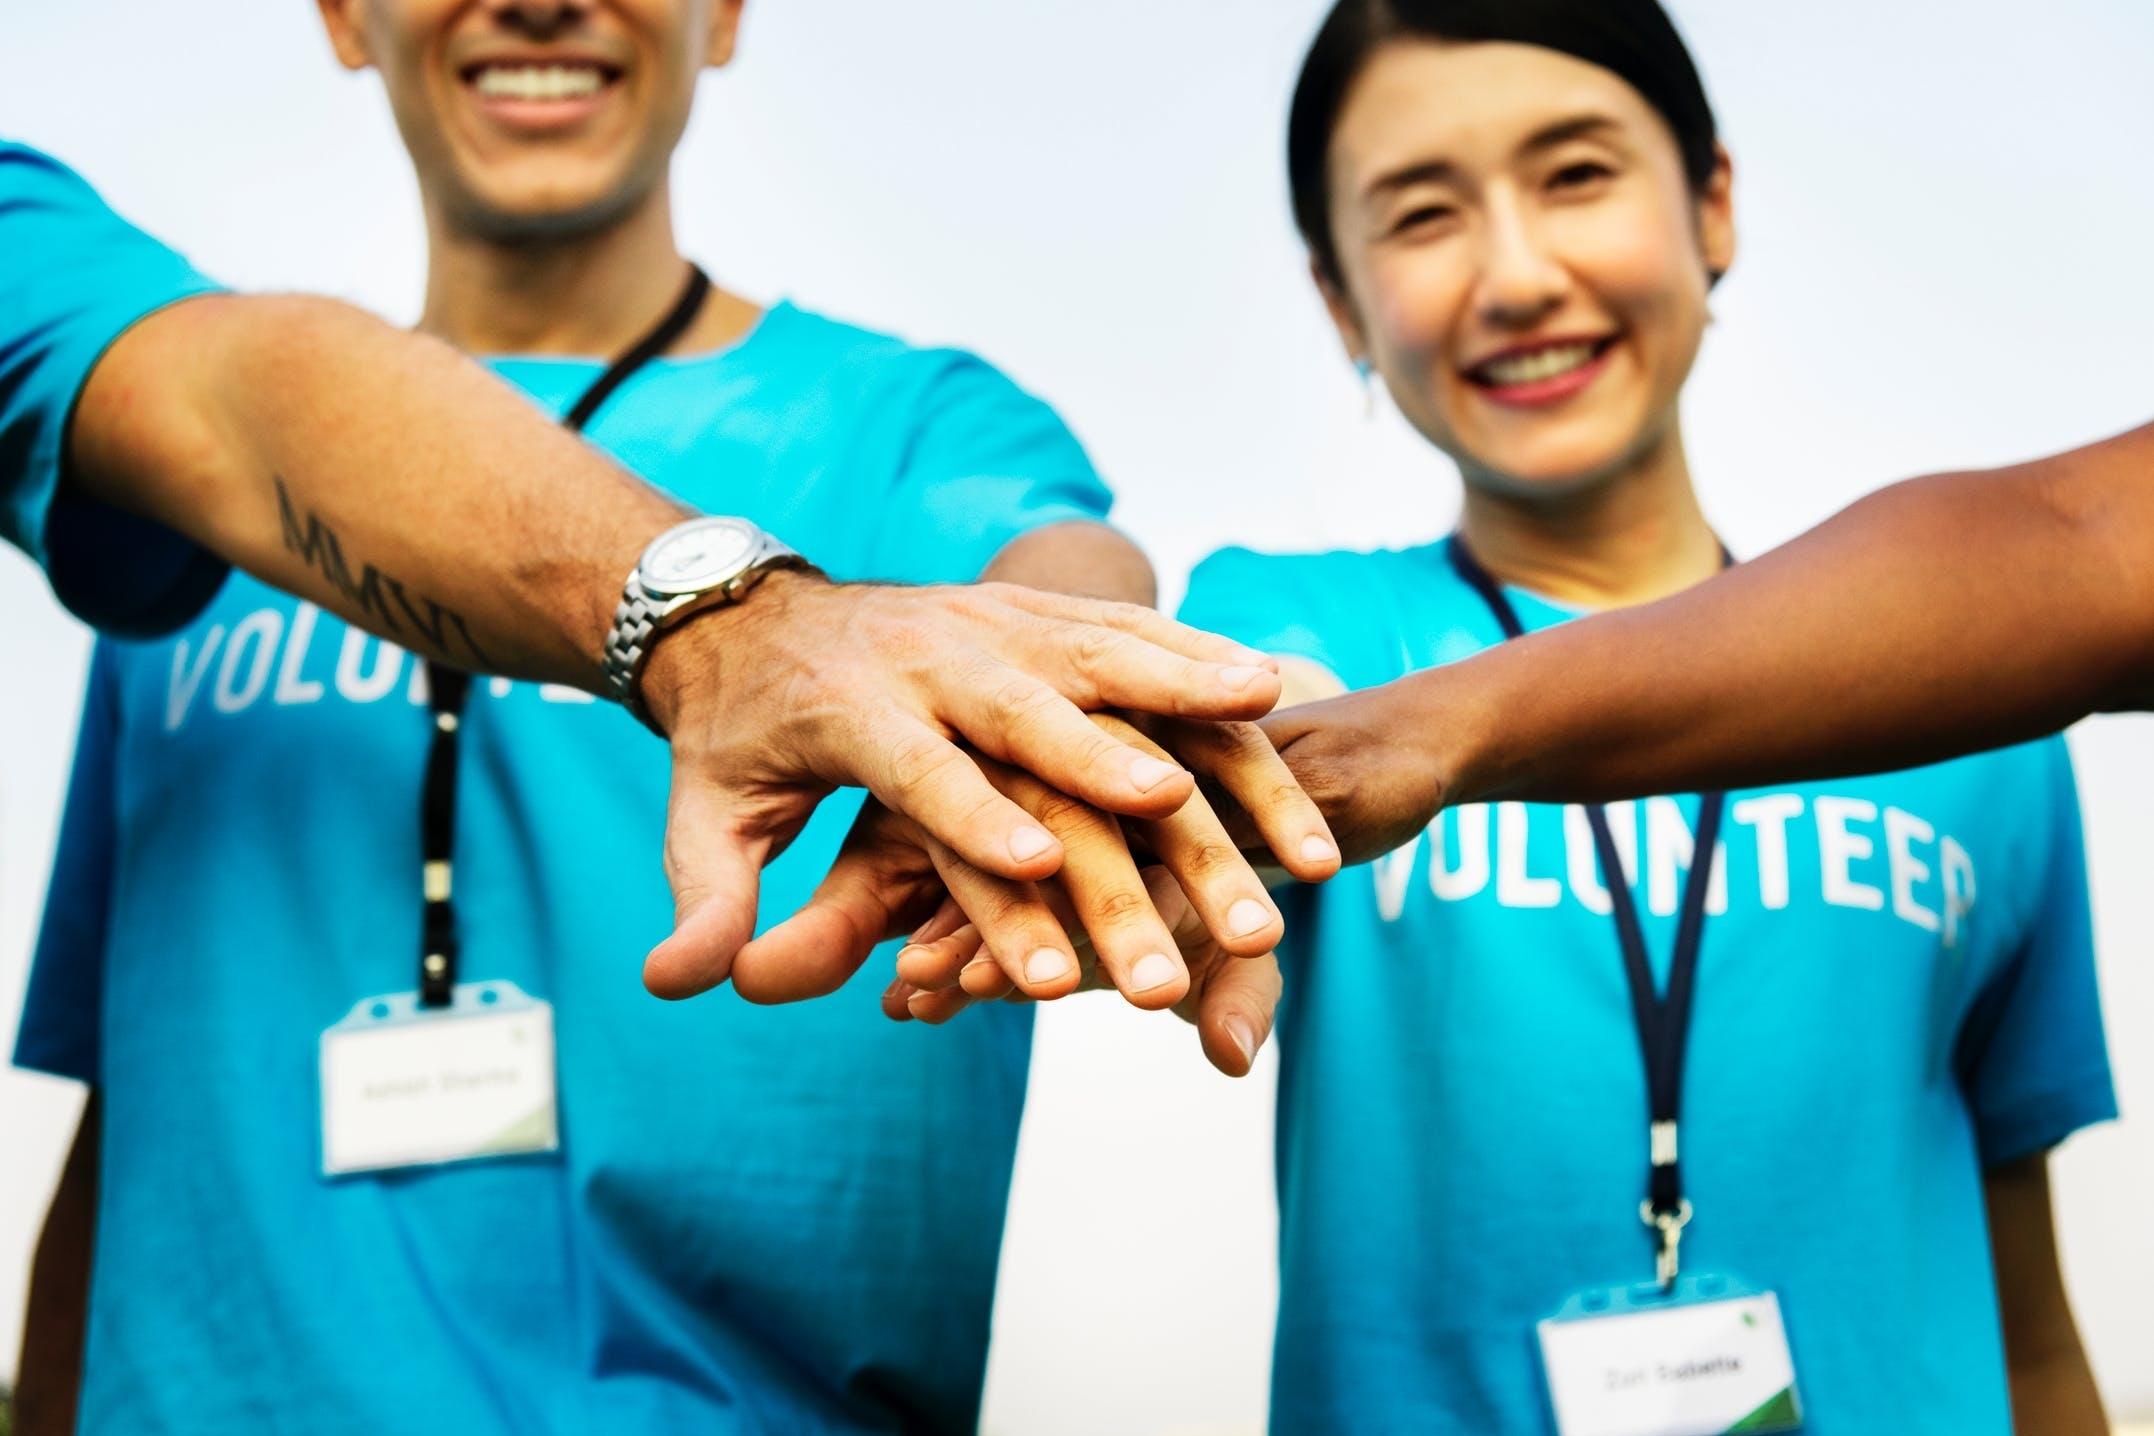 cOMMUNITY SERVICE & ACTIVISM -